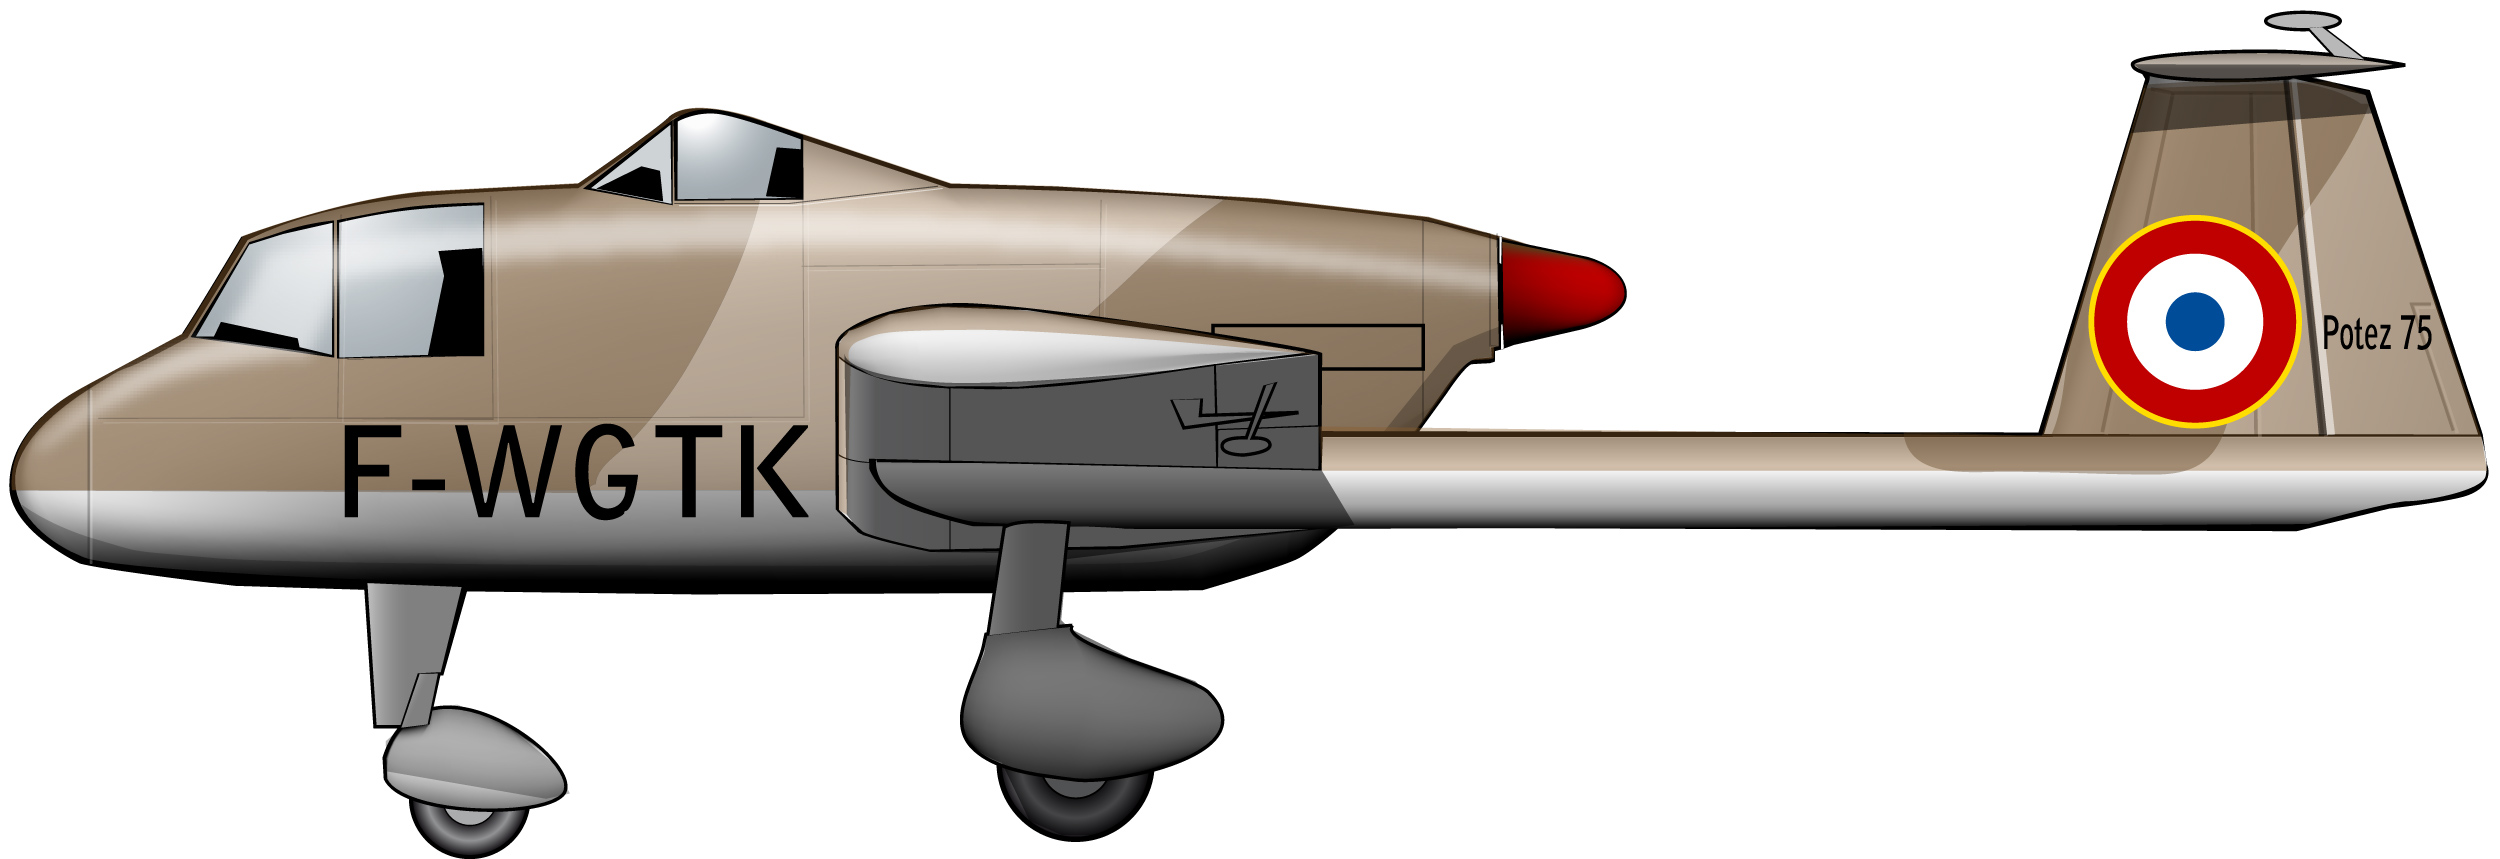 potez75argelia1956